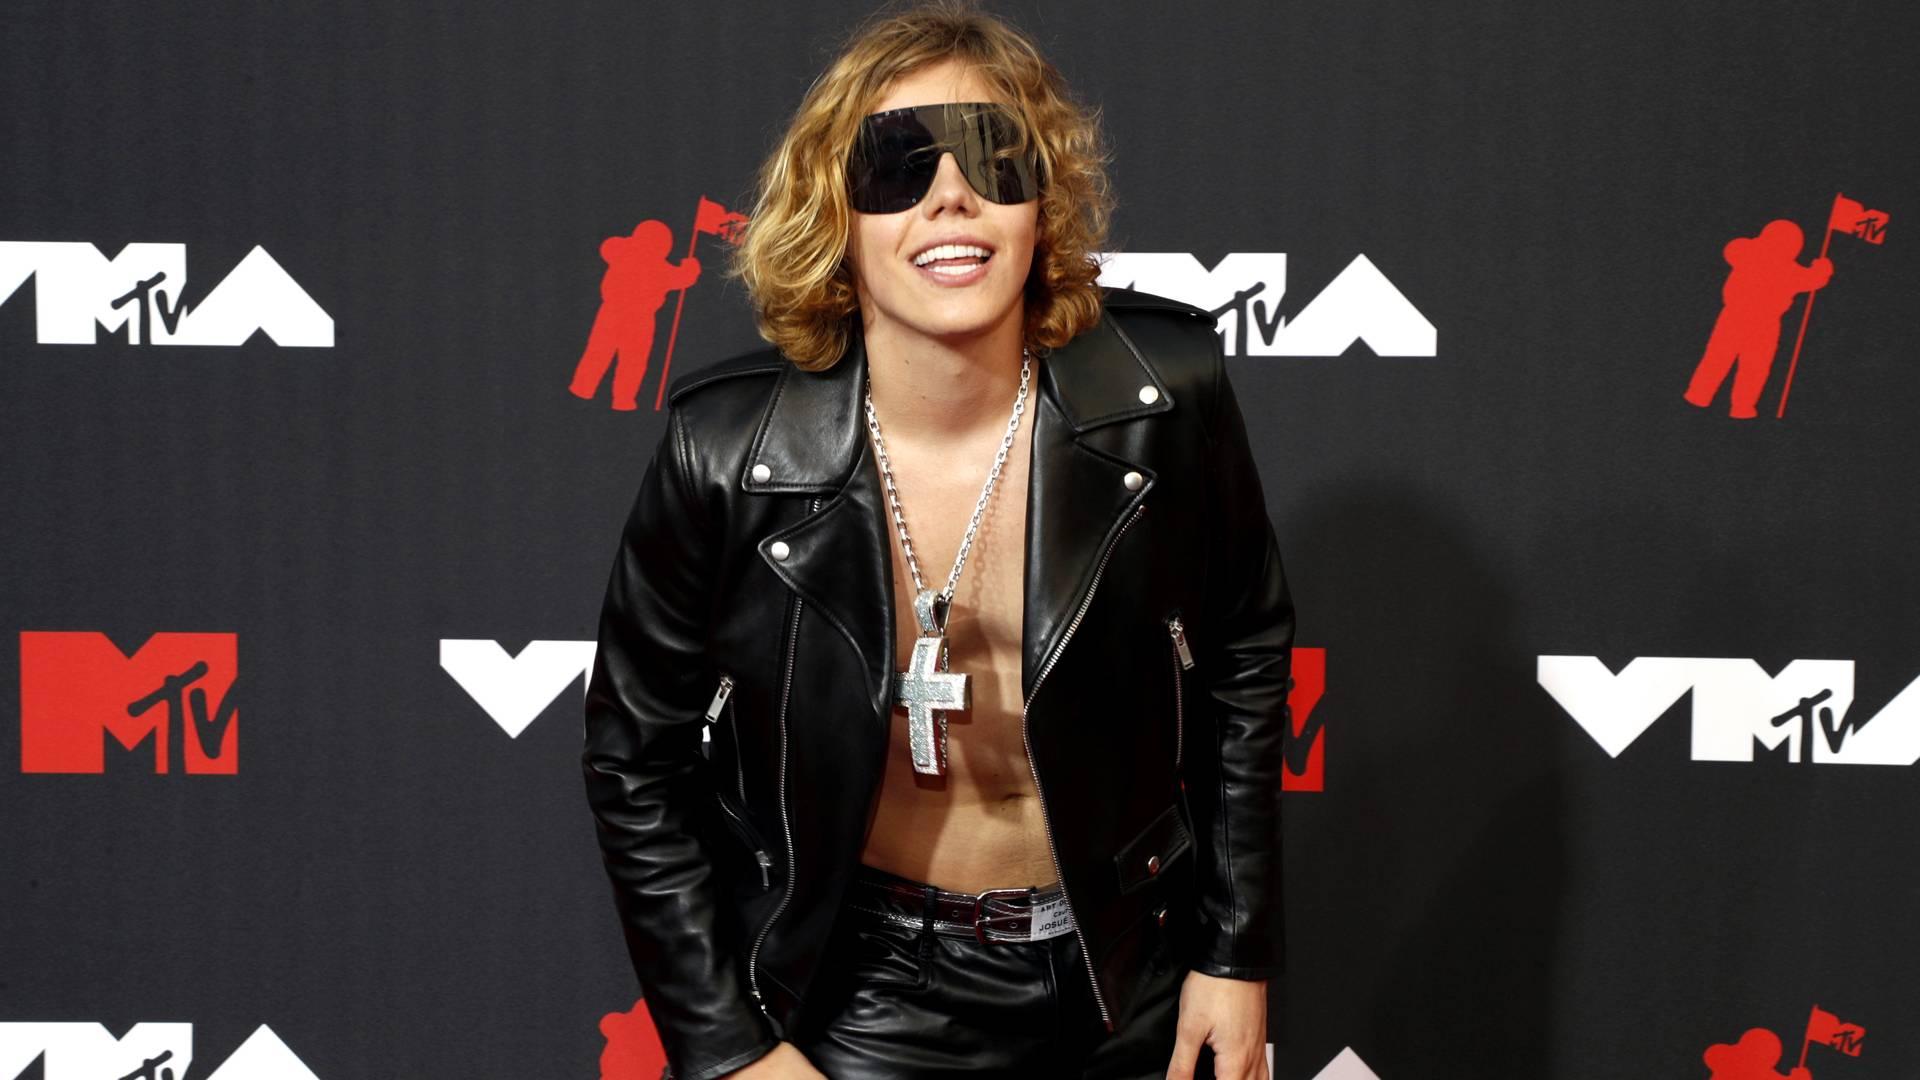 MTV Video Music Awards 2021 | The Best of the VMAs 2021 Red Carpet | The Kid LAROI | 1920x1080